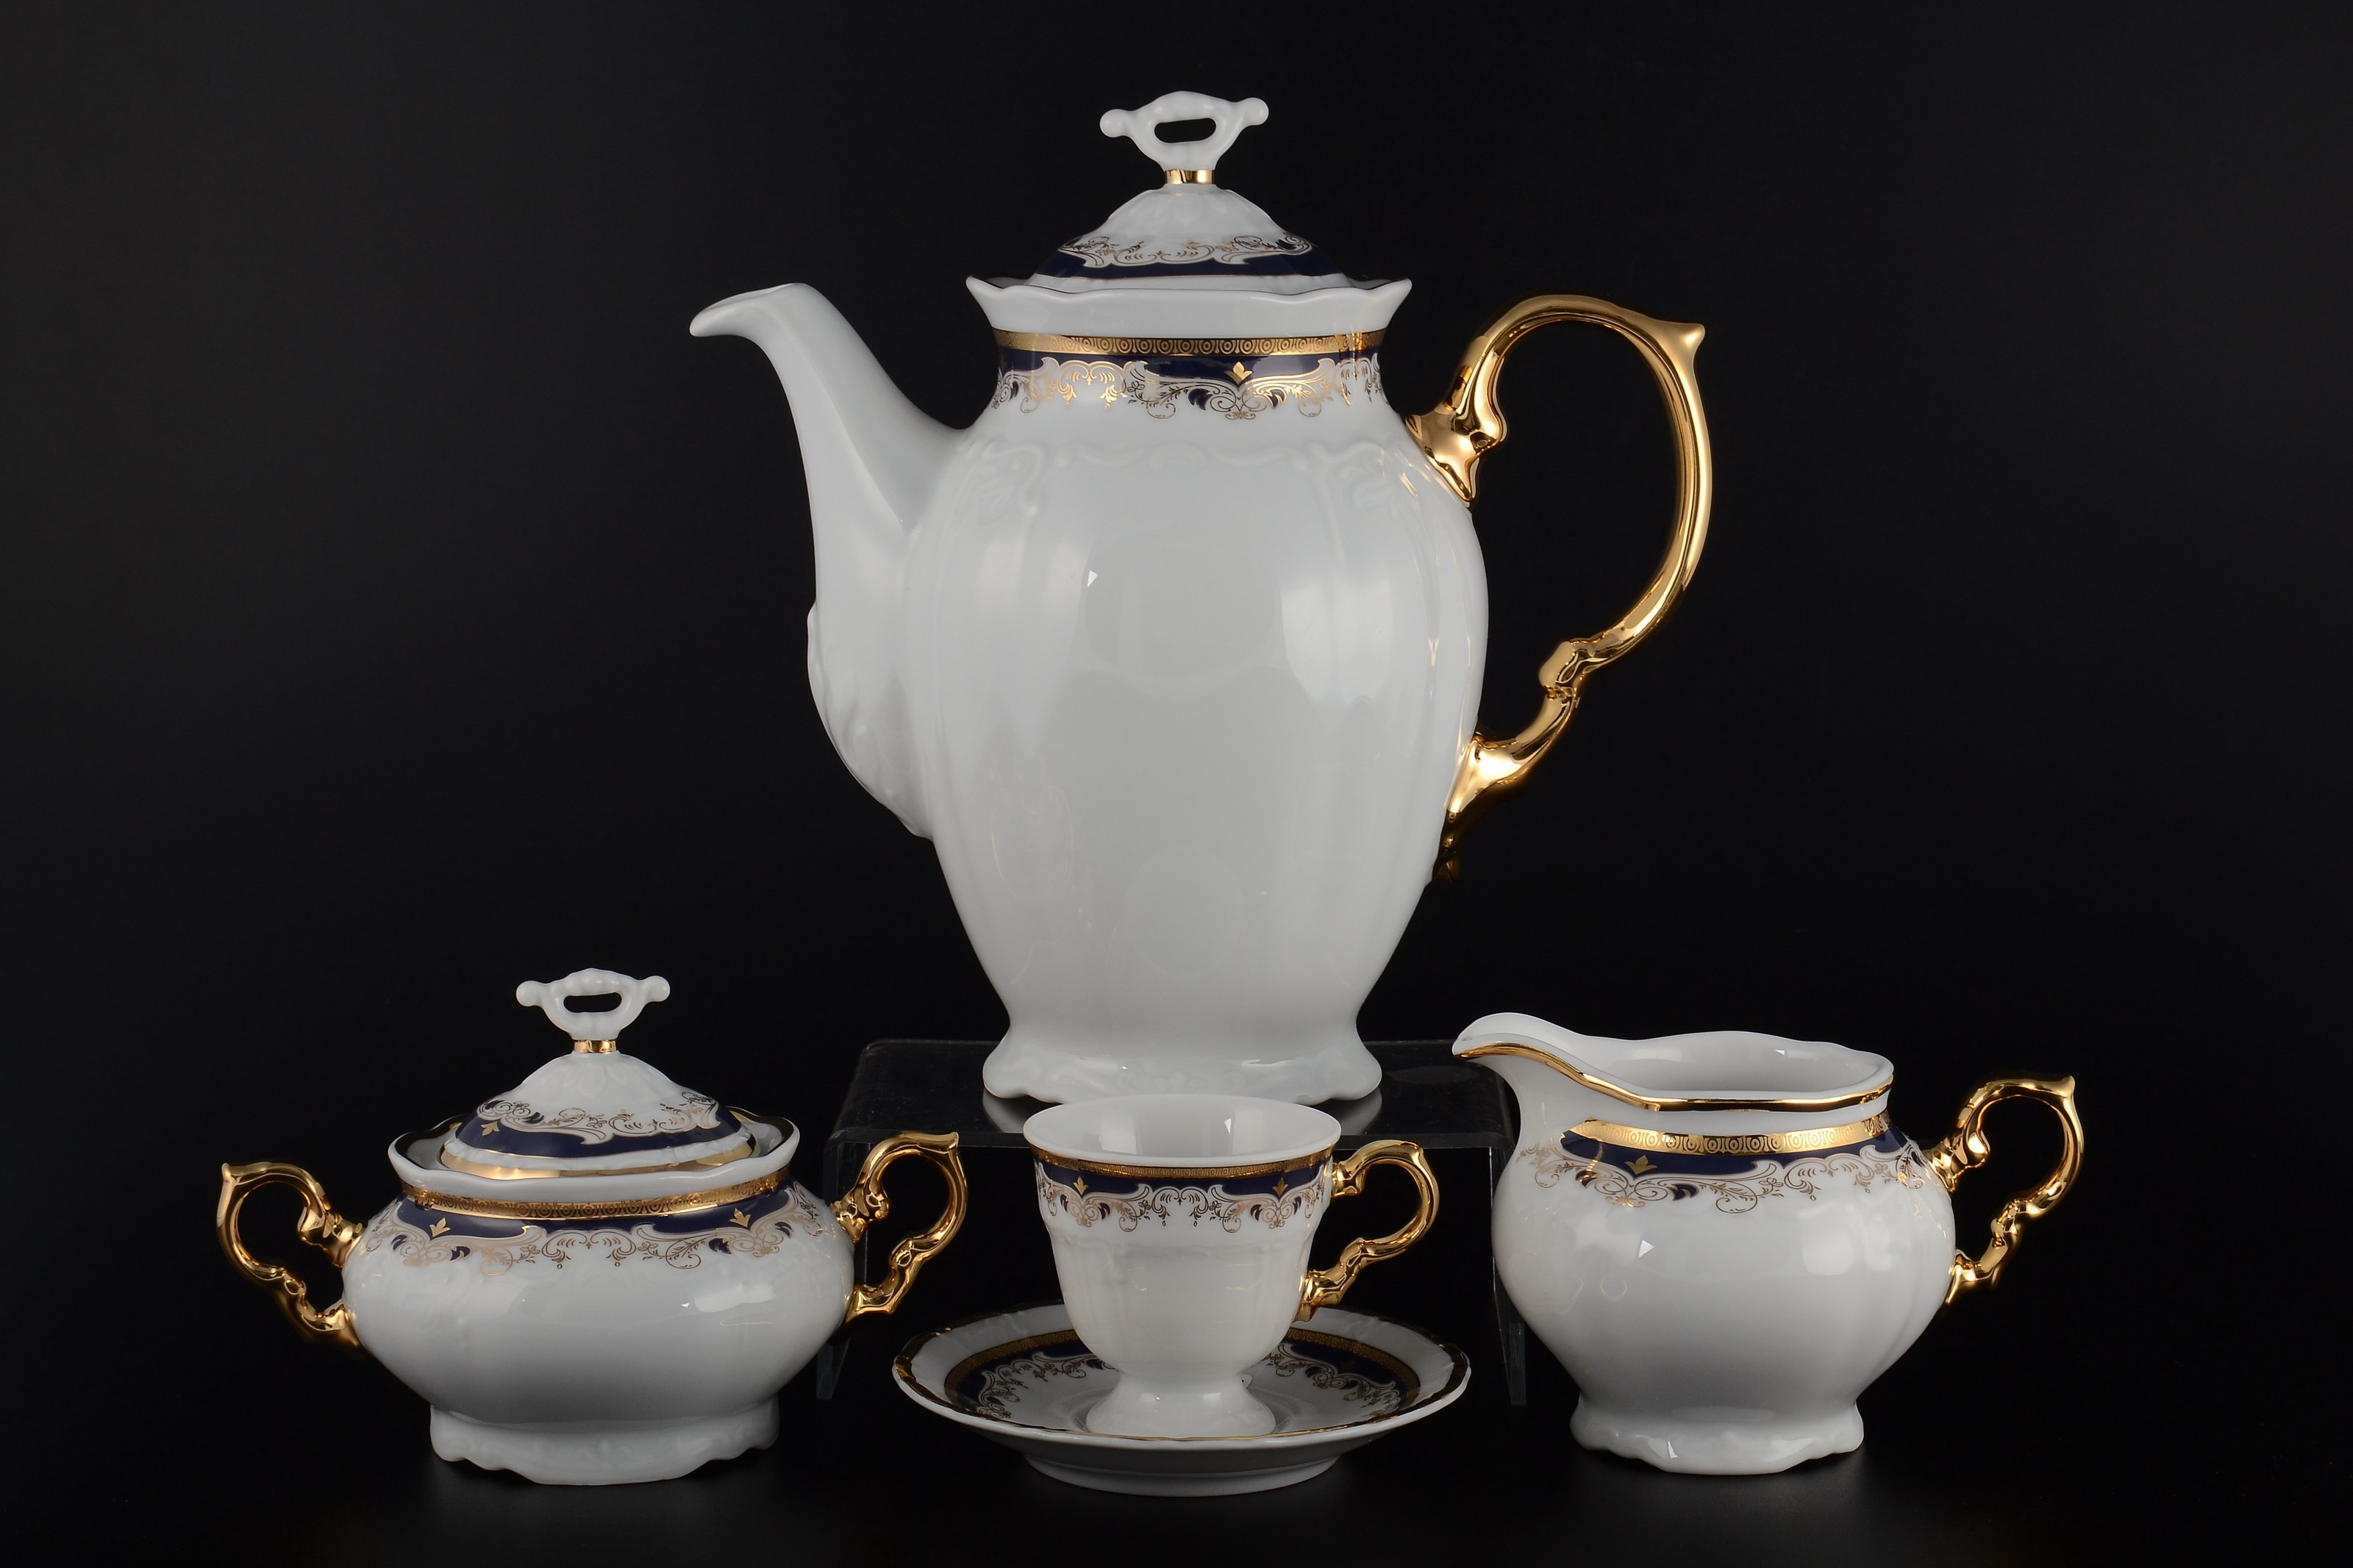 Кофейный сервиз МАРИЯ-ЛУИЗА СИНЯЯ ЛИЛИЯ от Thun 1794 a.s на 6 персон, 17 предметов